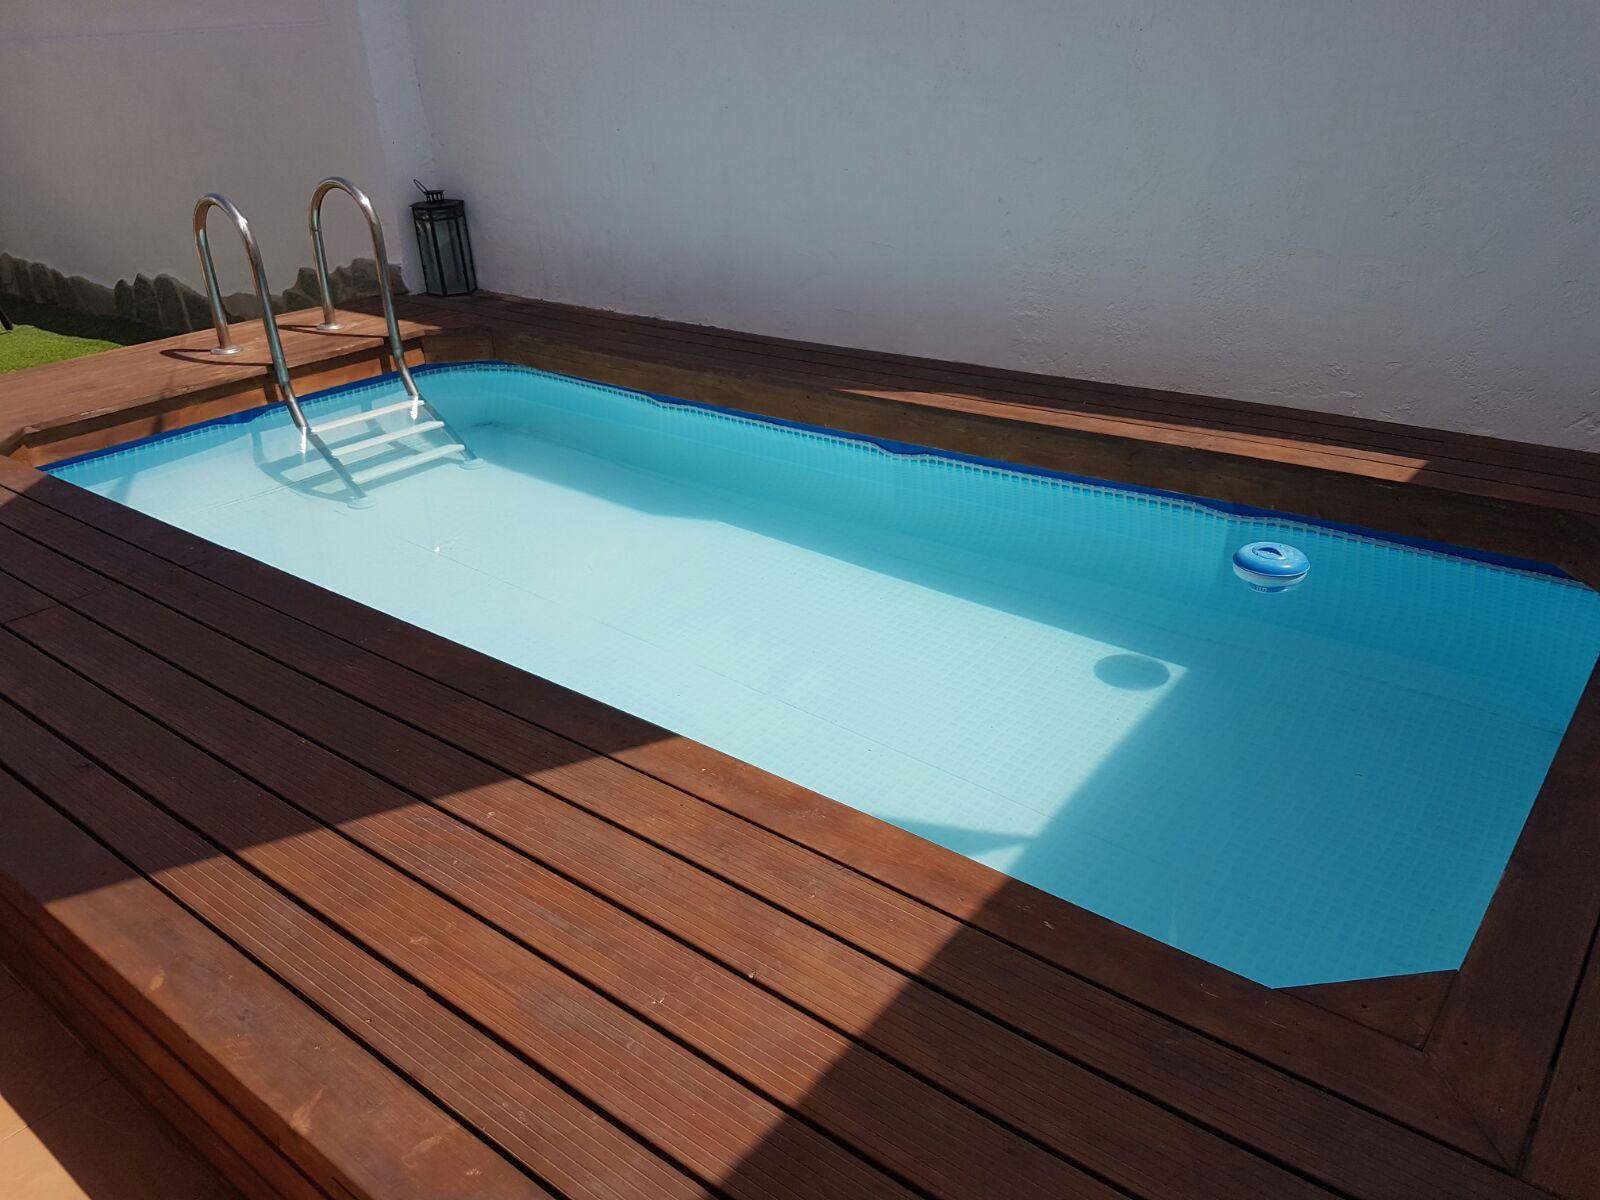 Tratamiento de piscina de madera megapiscinas for Tratamientos de piscinas